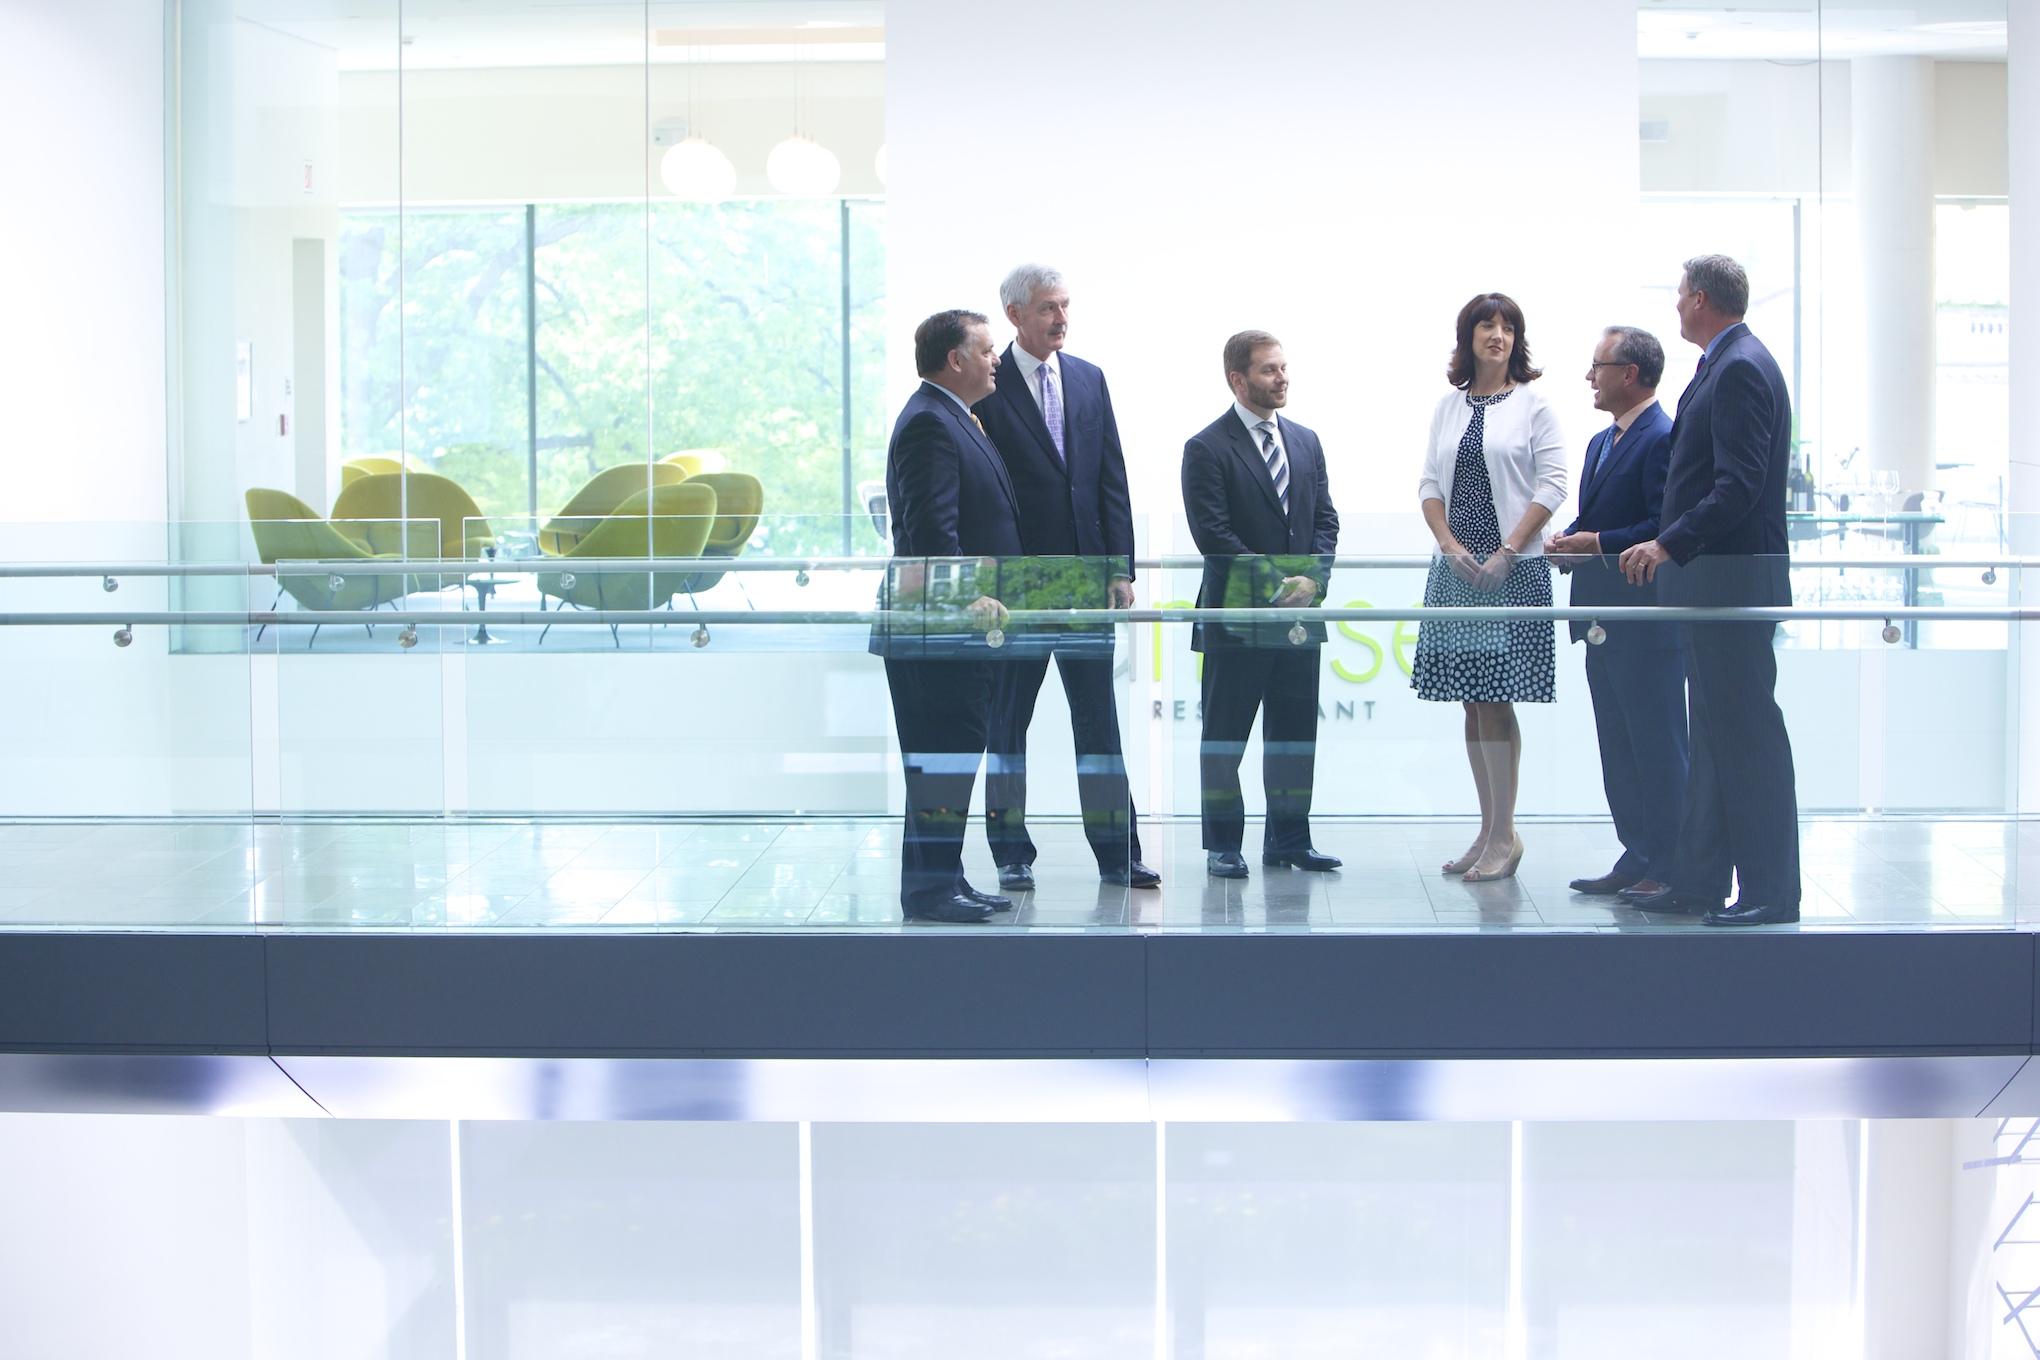 A financial team holds an impromptu meeting in a modern space.